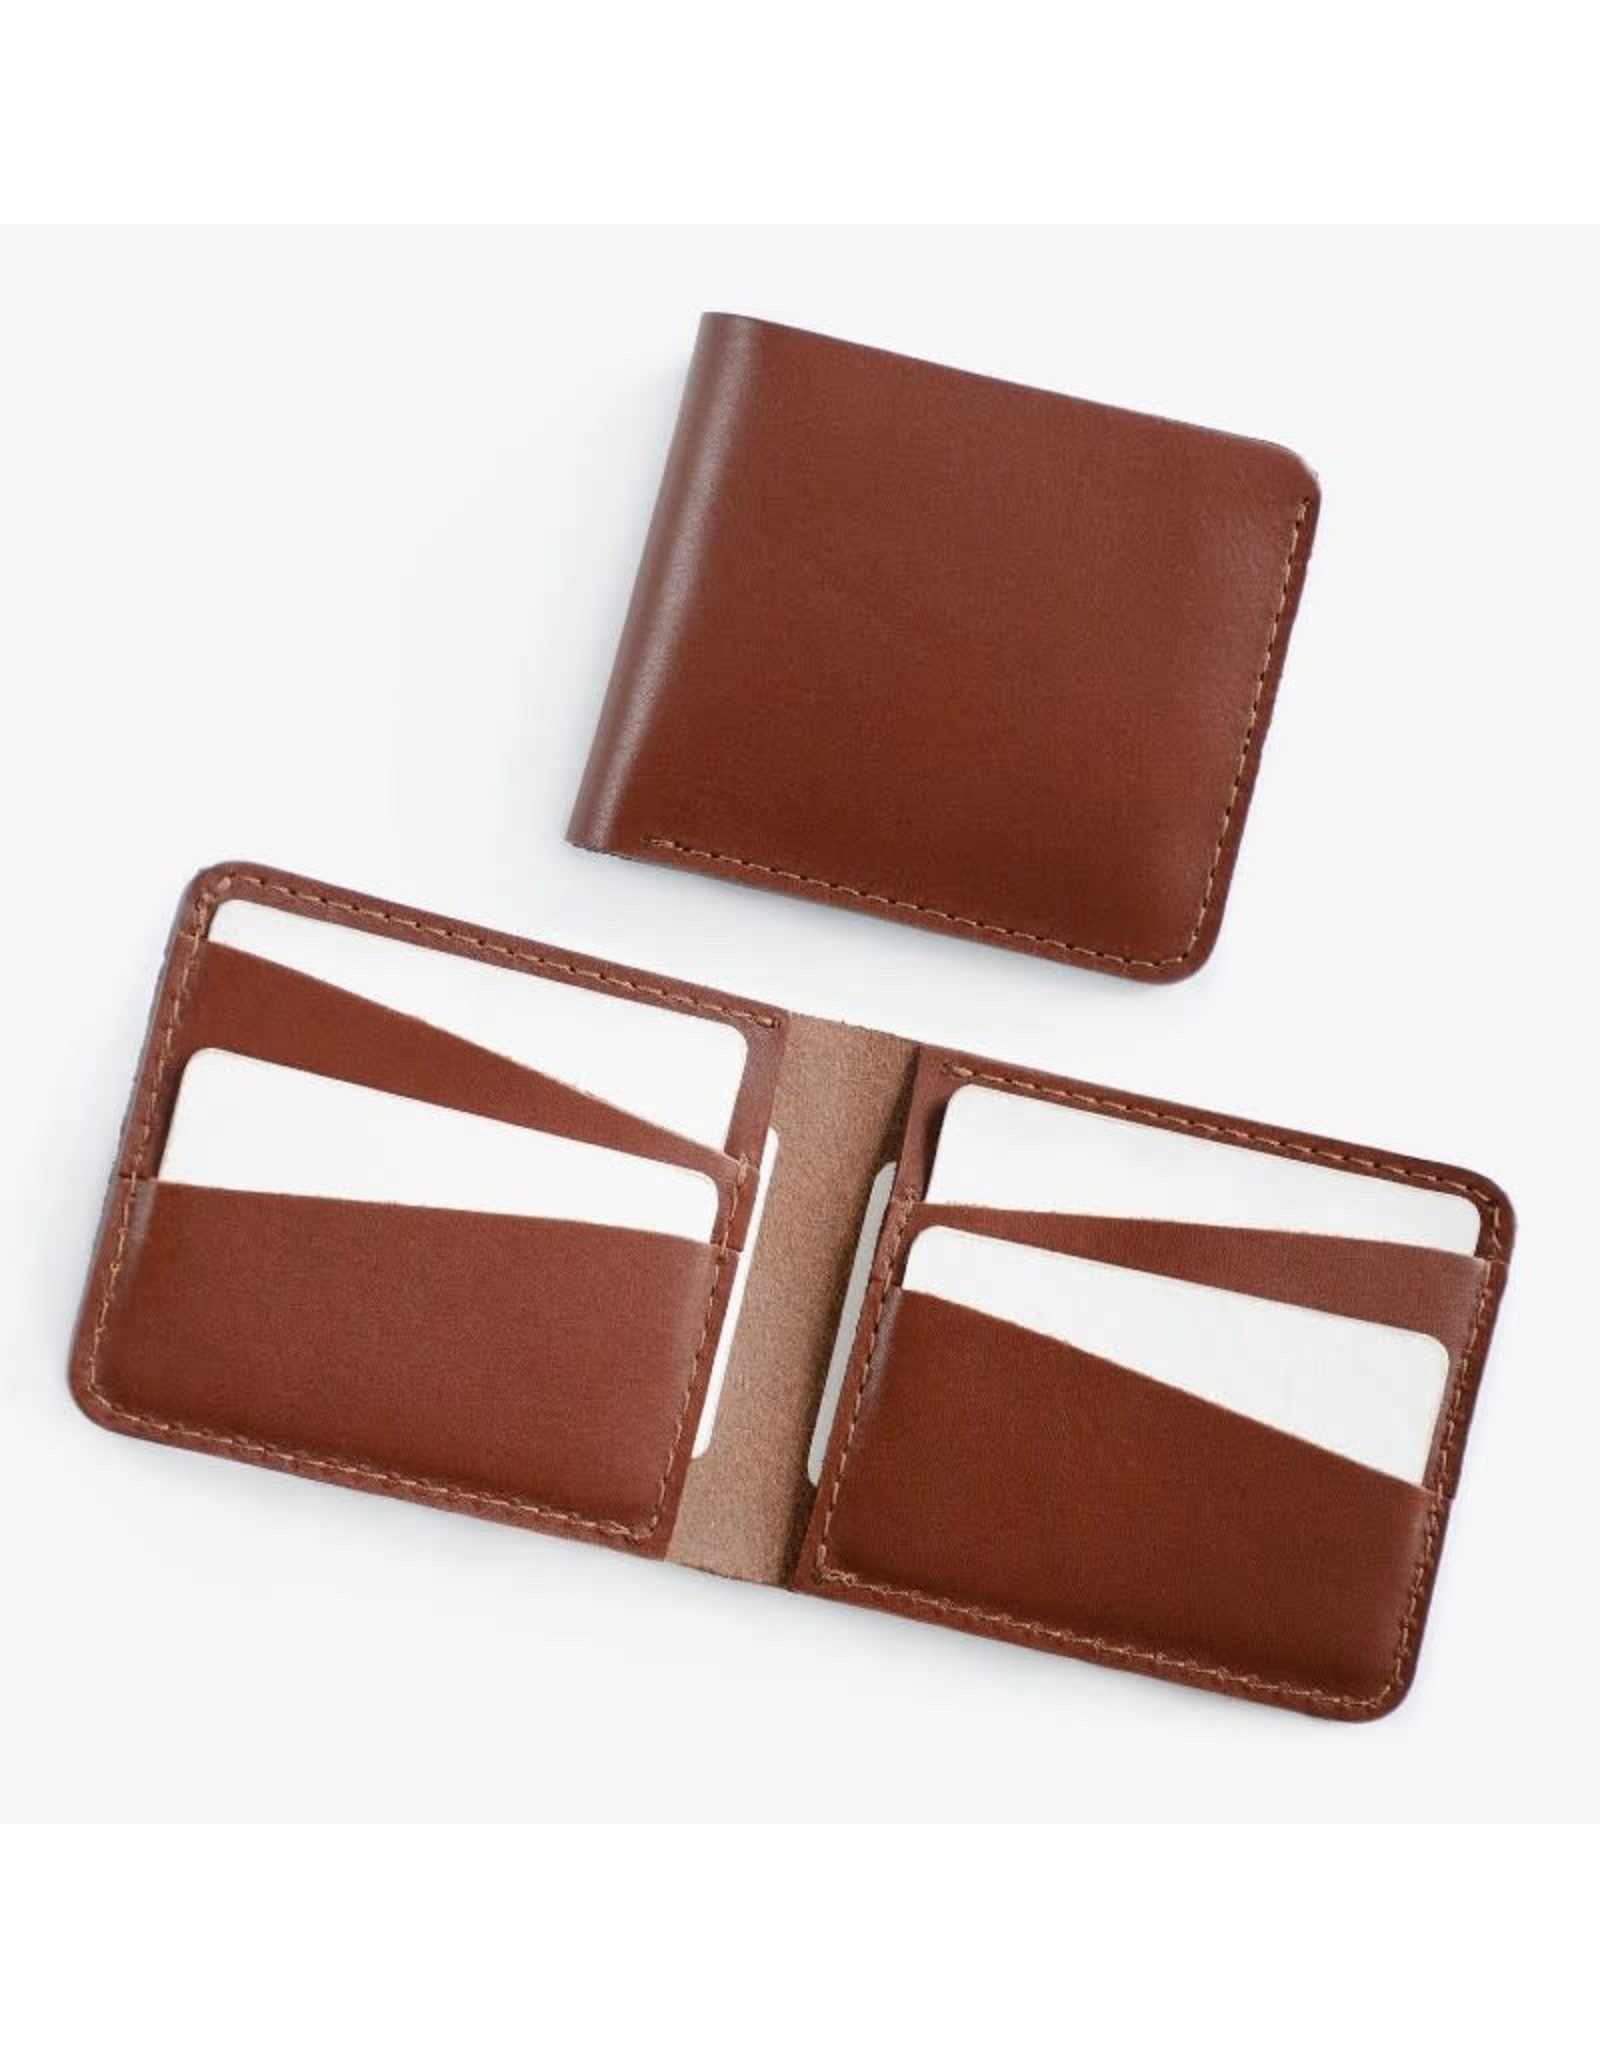 Fab' Portefeuille horizontal Fab' cuir brun